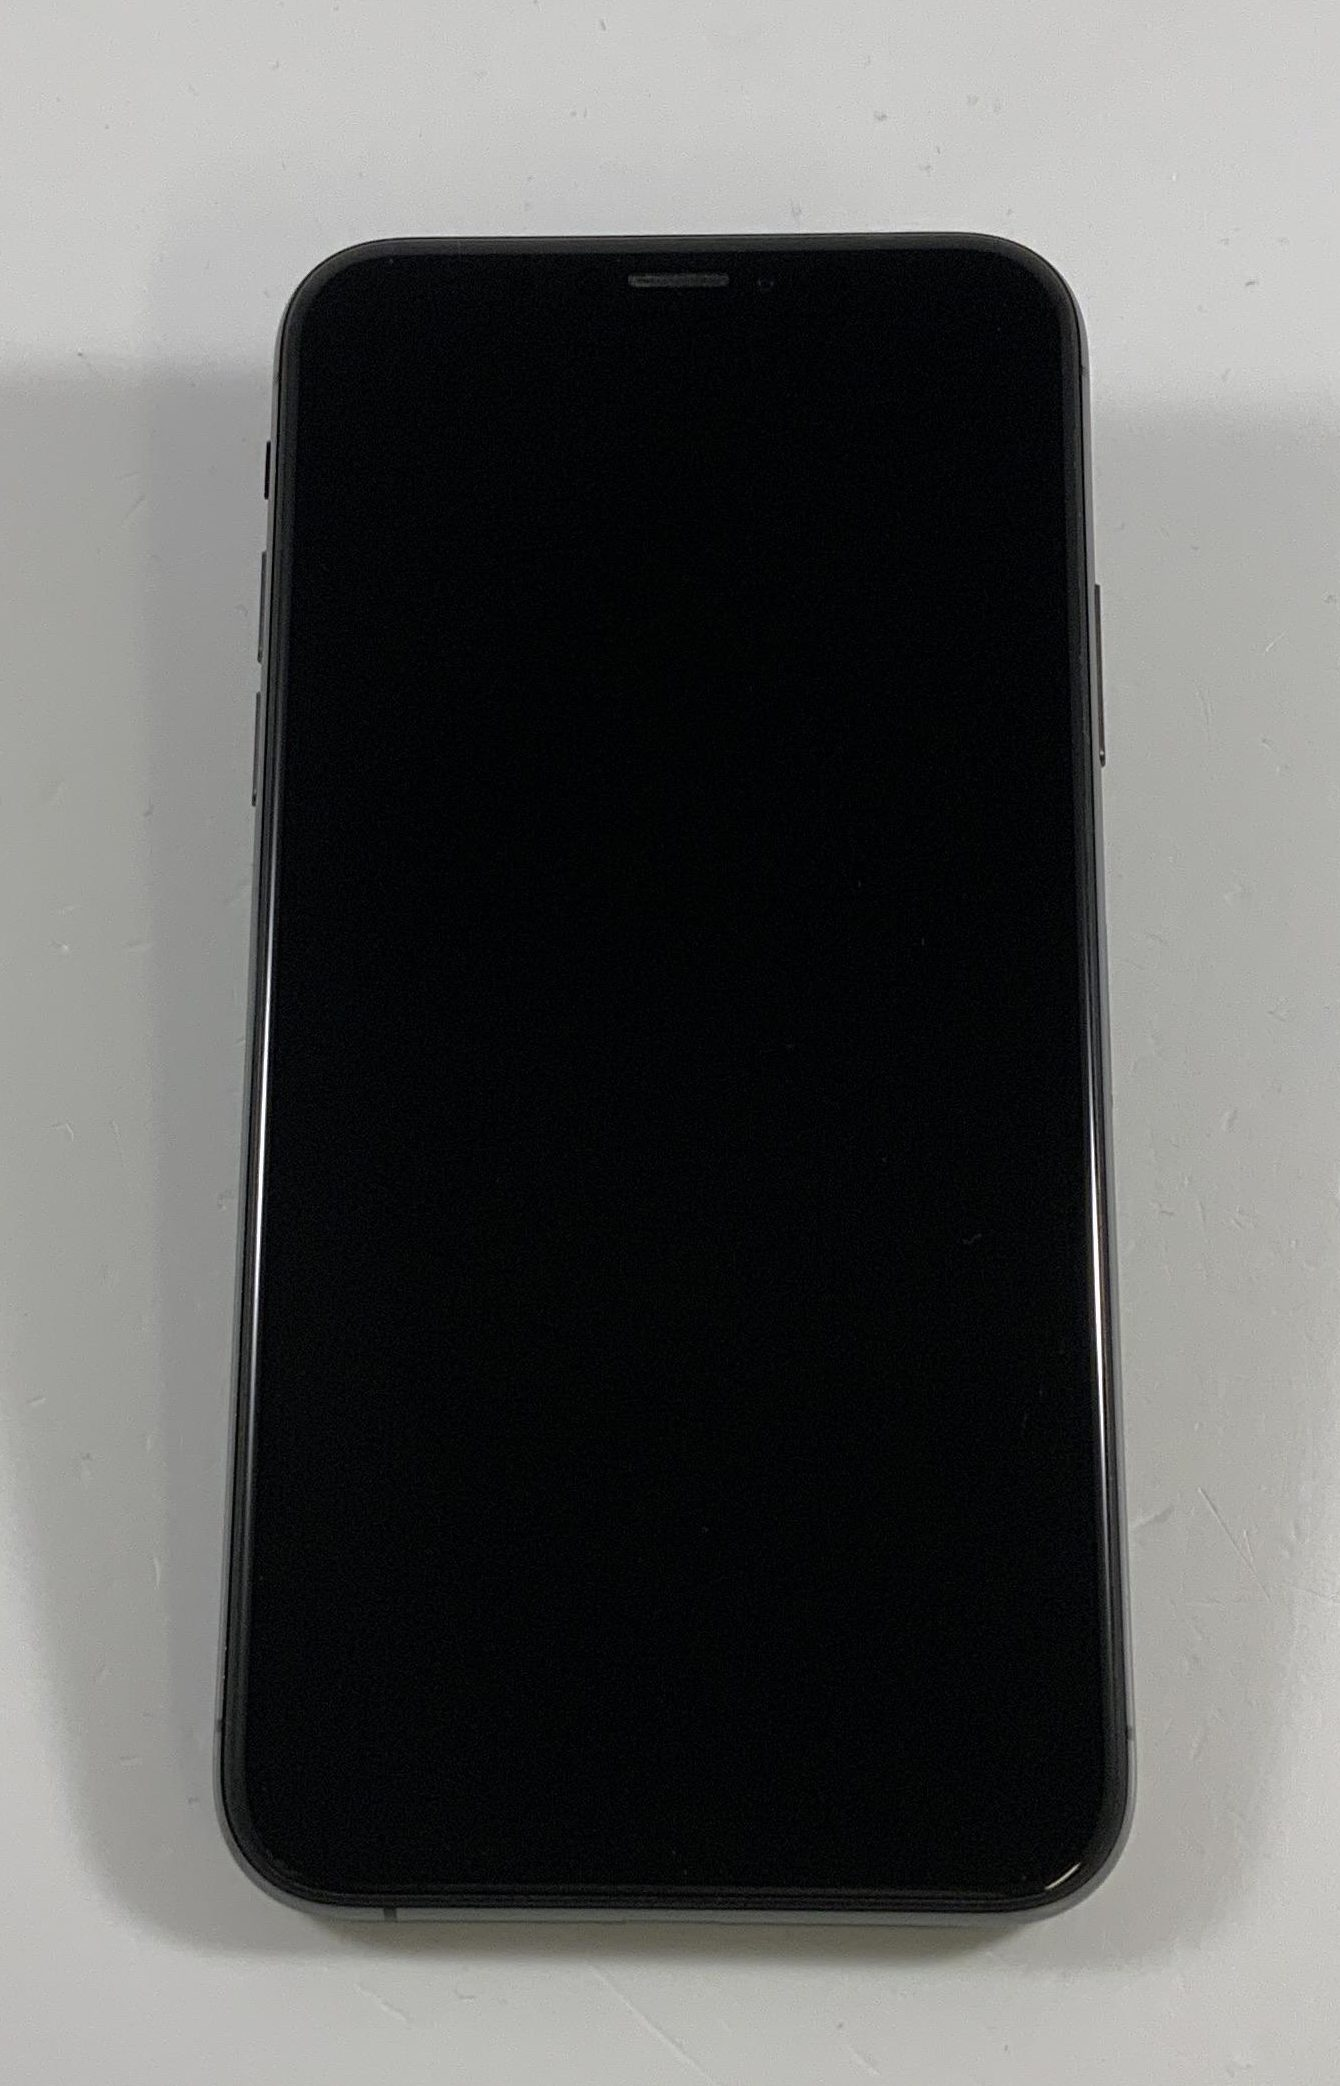 iPhone XS 64GB, 64GB, Space Gray, obraz 1